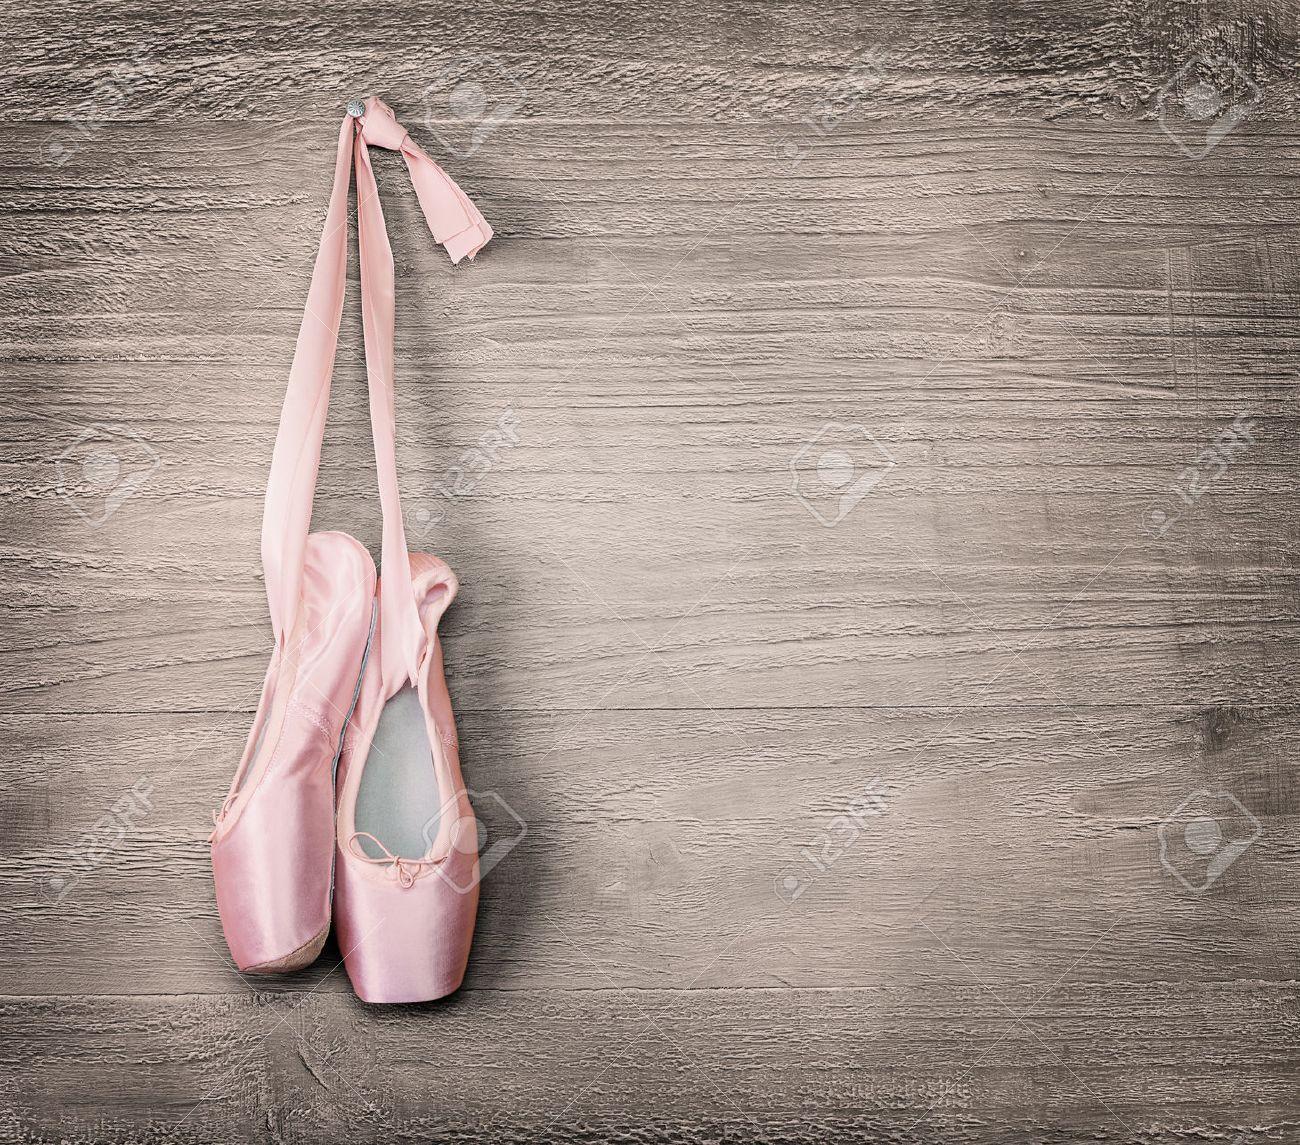 Free Download New Pink Ballet Shoes Hanging On Wooden Background Vintage Style 1300x1145 For Your Desktop Mobile Tablet Explore 41 Shoe Background Shoe Wallpaper Shoe Background Jordan Shoe Wallpaper